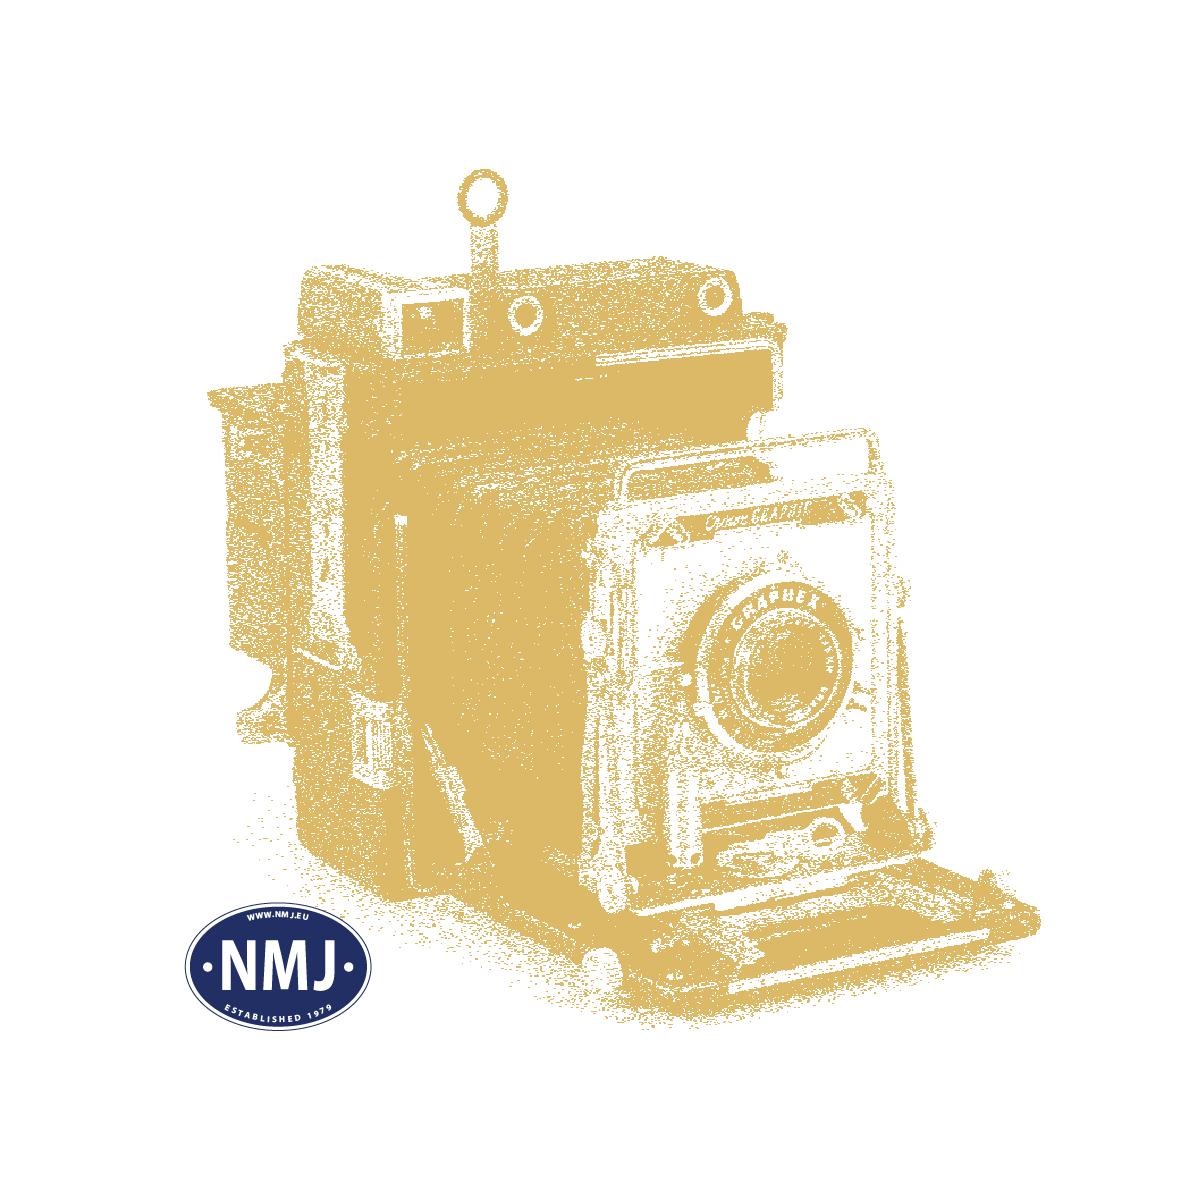 "NMJT136.301 - NMJ Topline NSB CB2 21228 ""Intercity Spesial"", Nydesign, 1986"